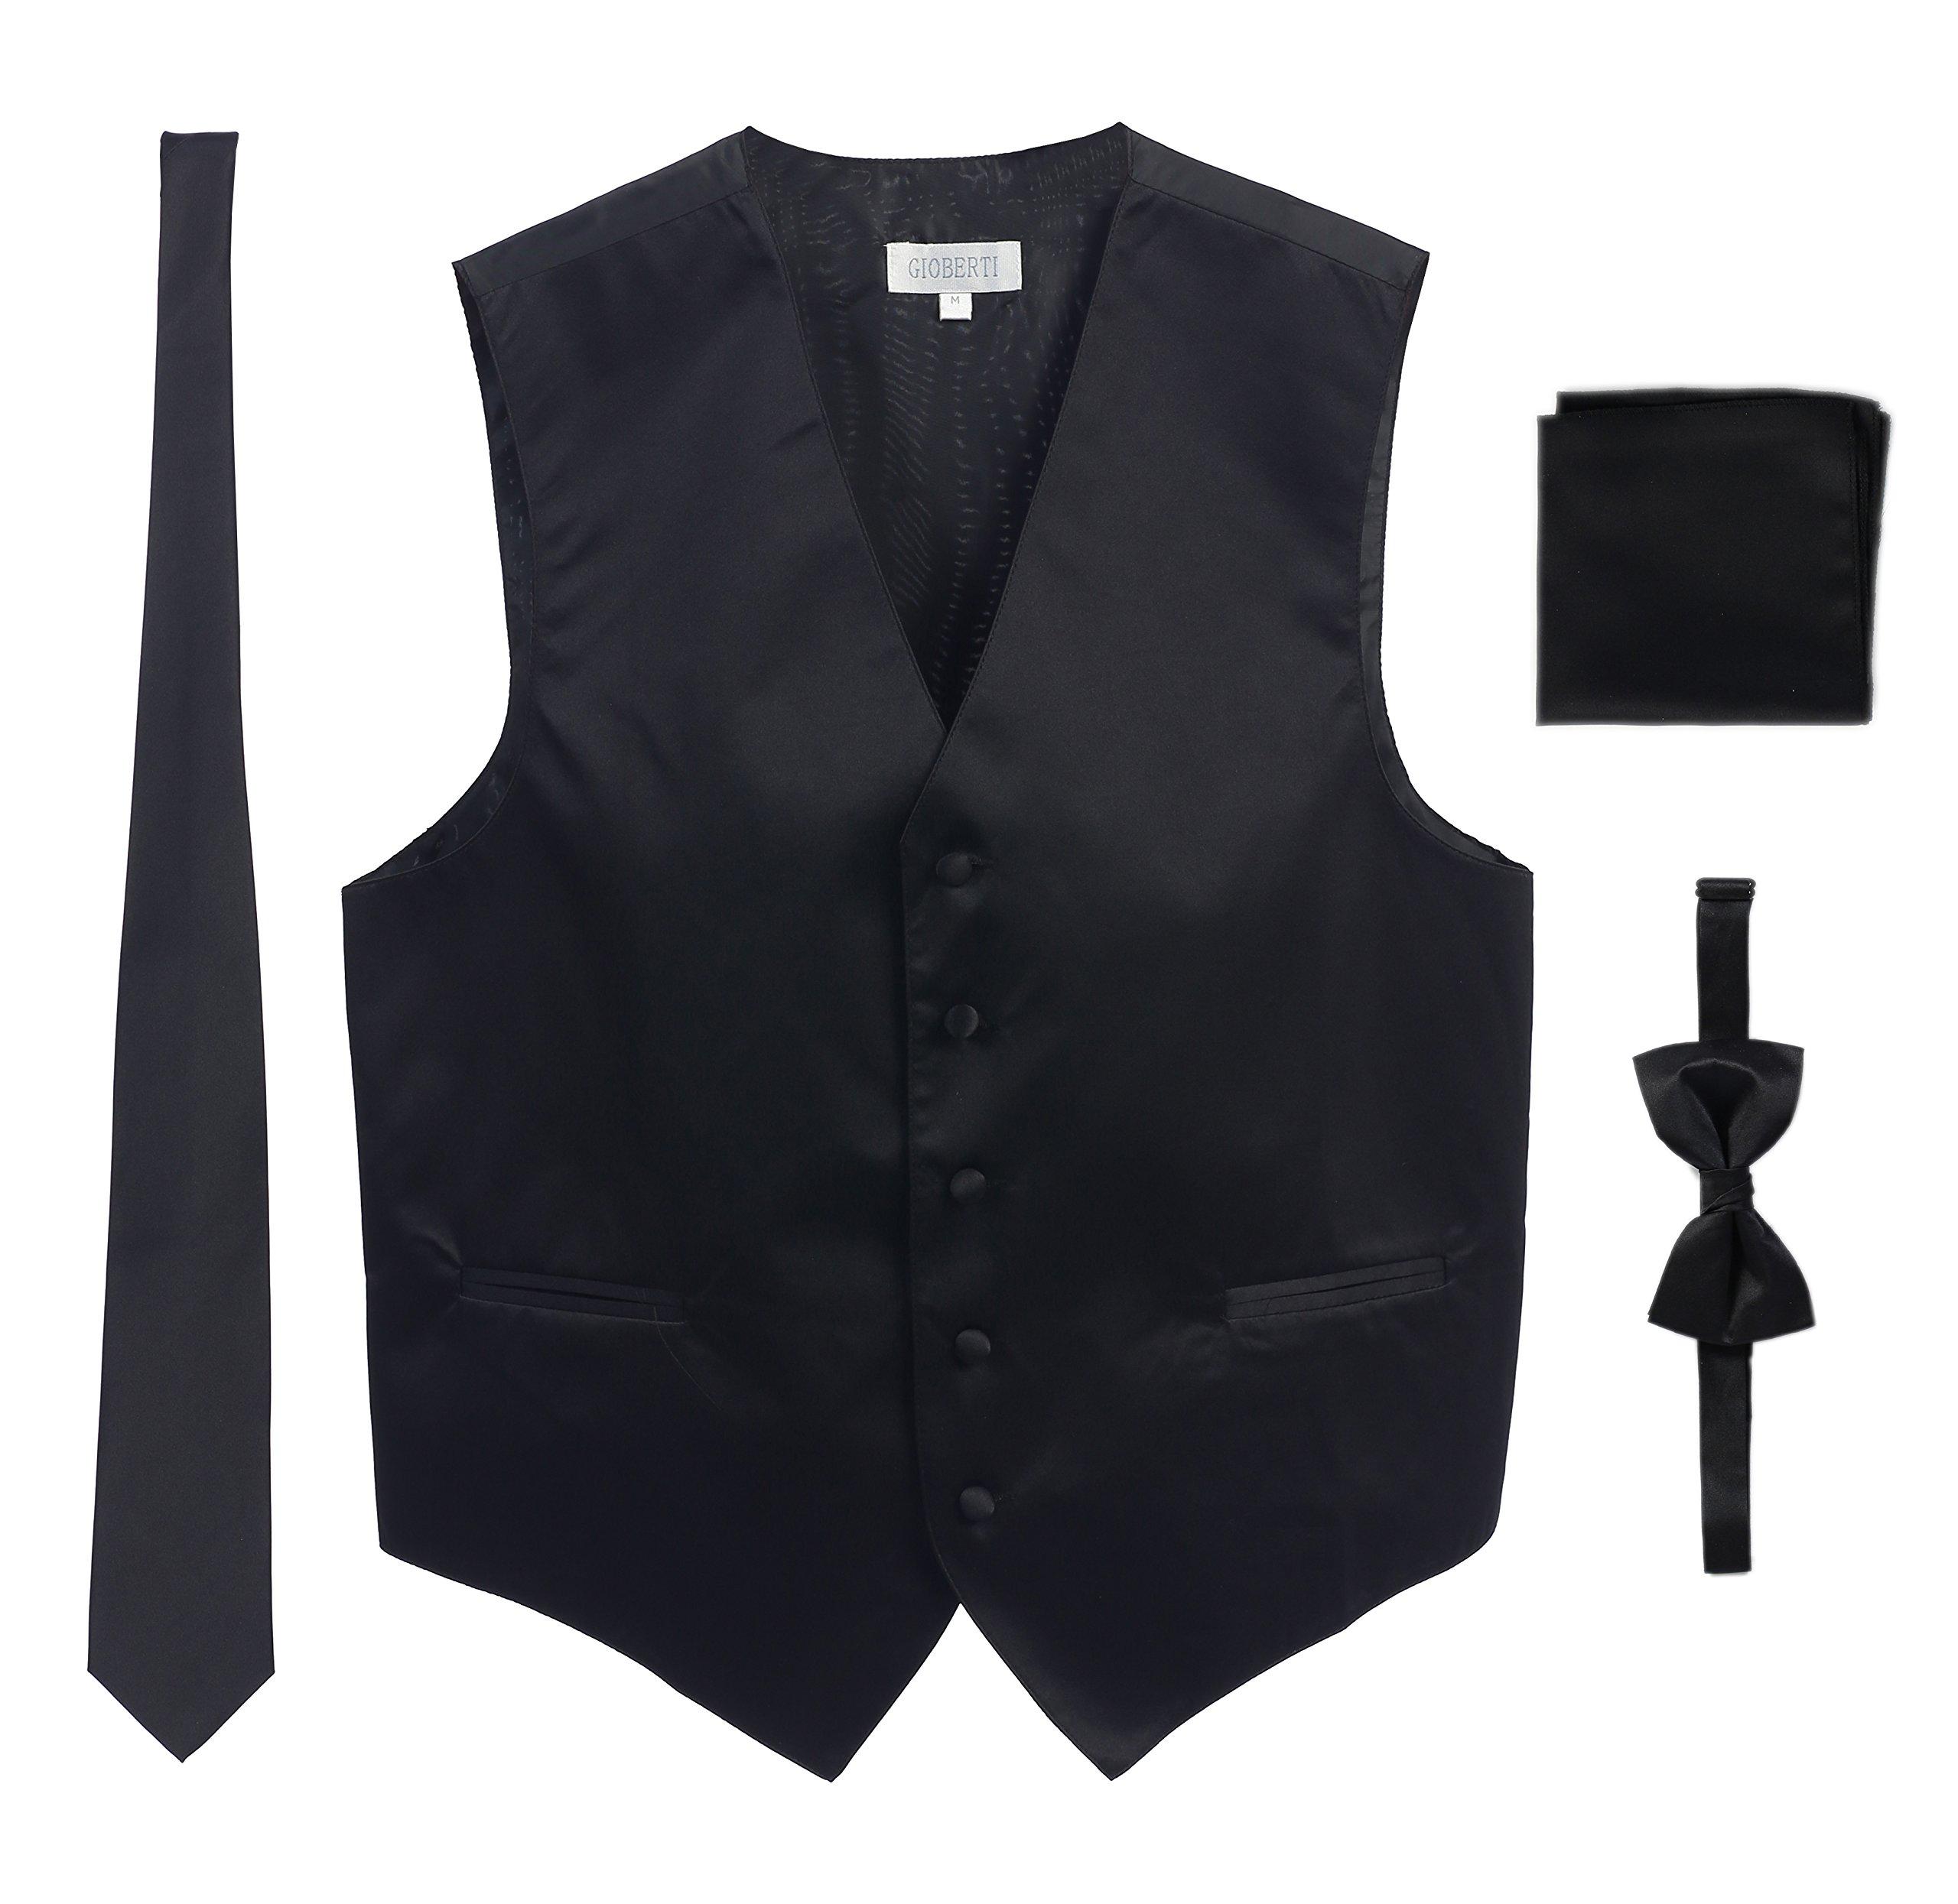 Men's Formal Vest Set, Bowtie, Tie, Pocket Square, Black, 2X Large by Gioberti